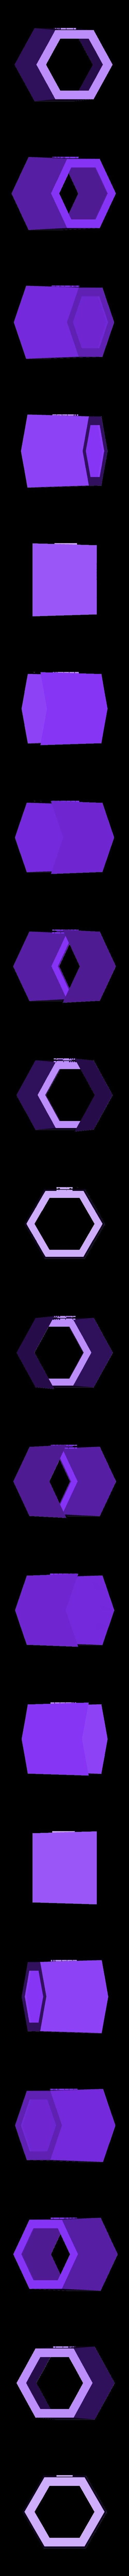 LH_hexa_body2_fixed_oben_v2.stl Download free STL file Lighthouse • 3D printing template, jteix